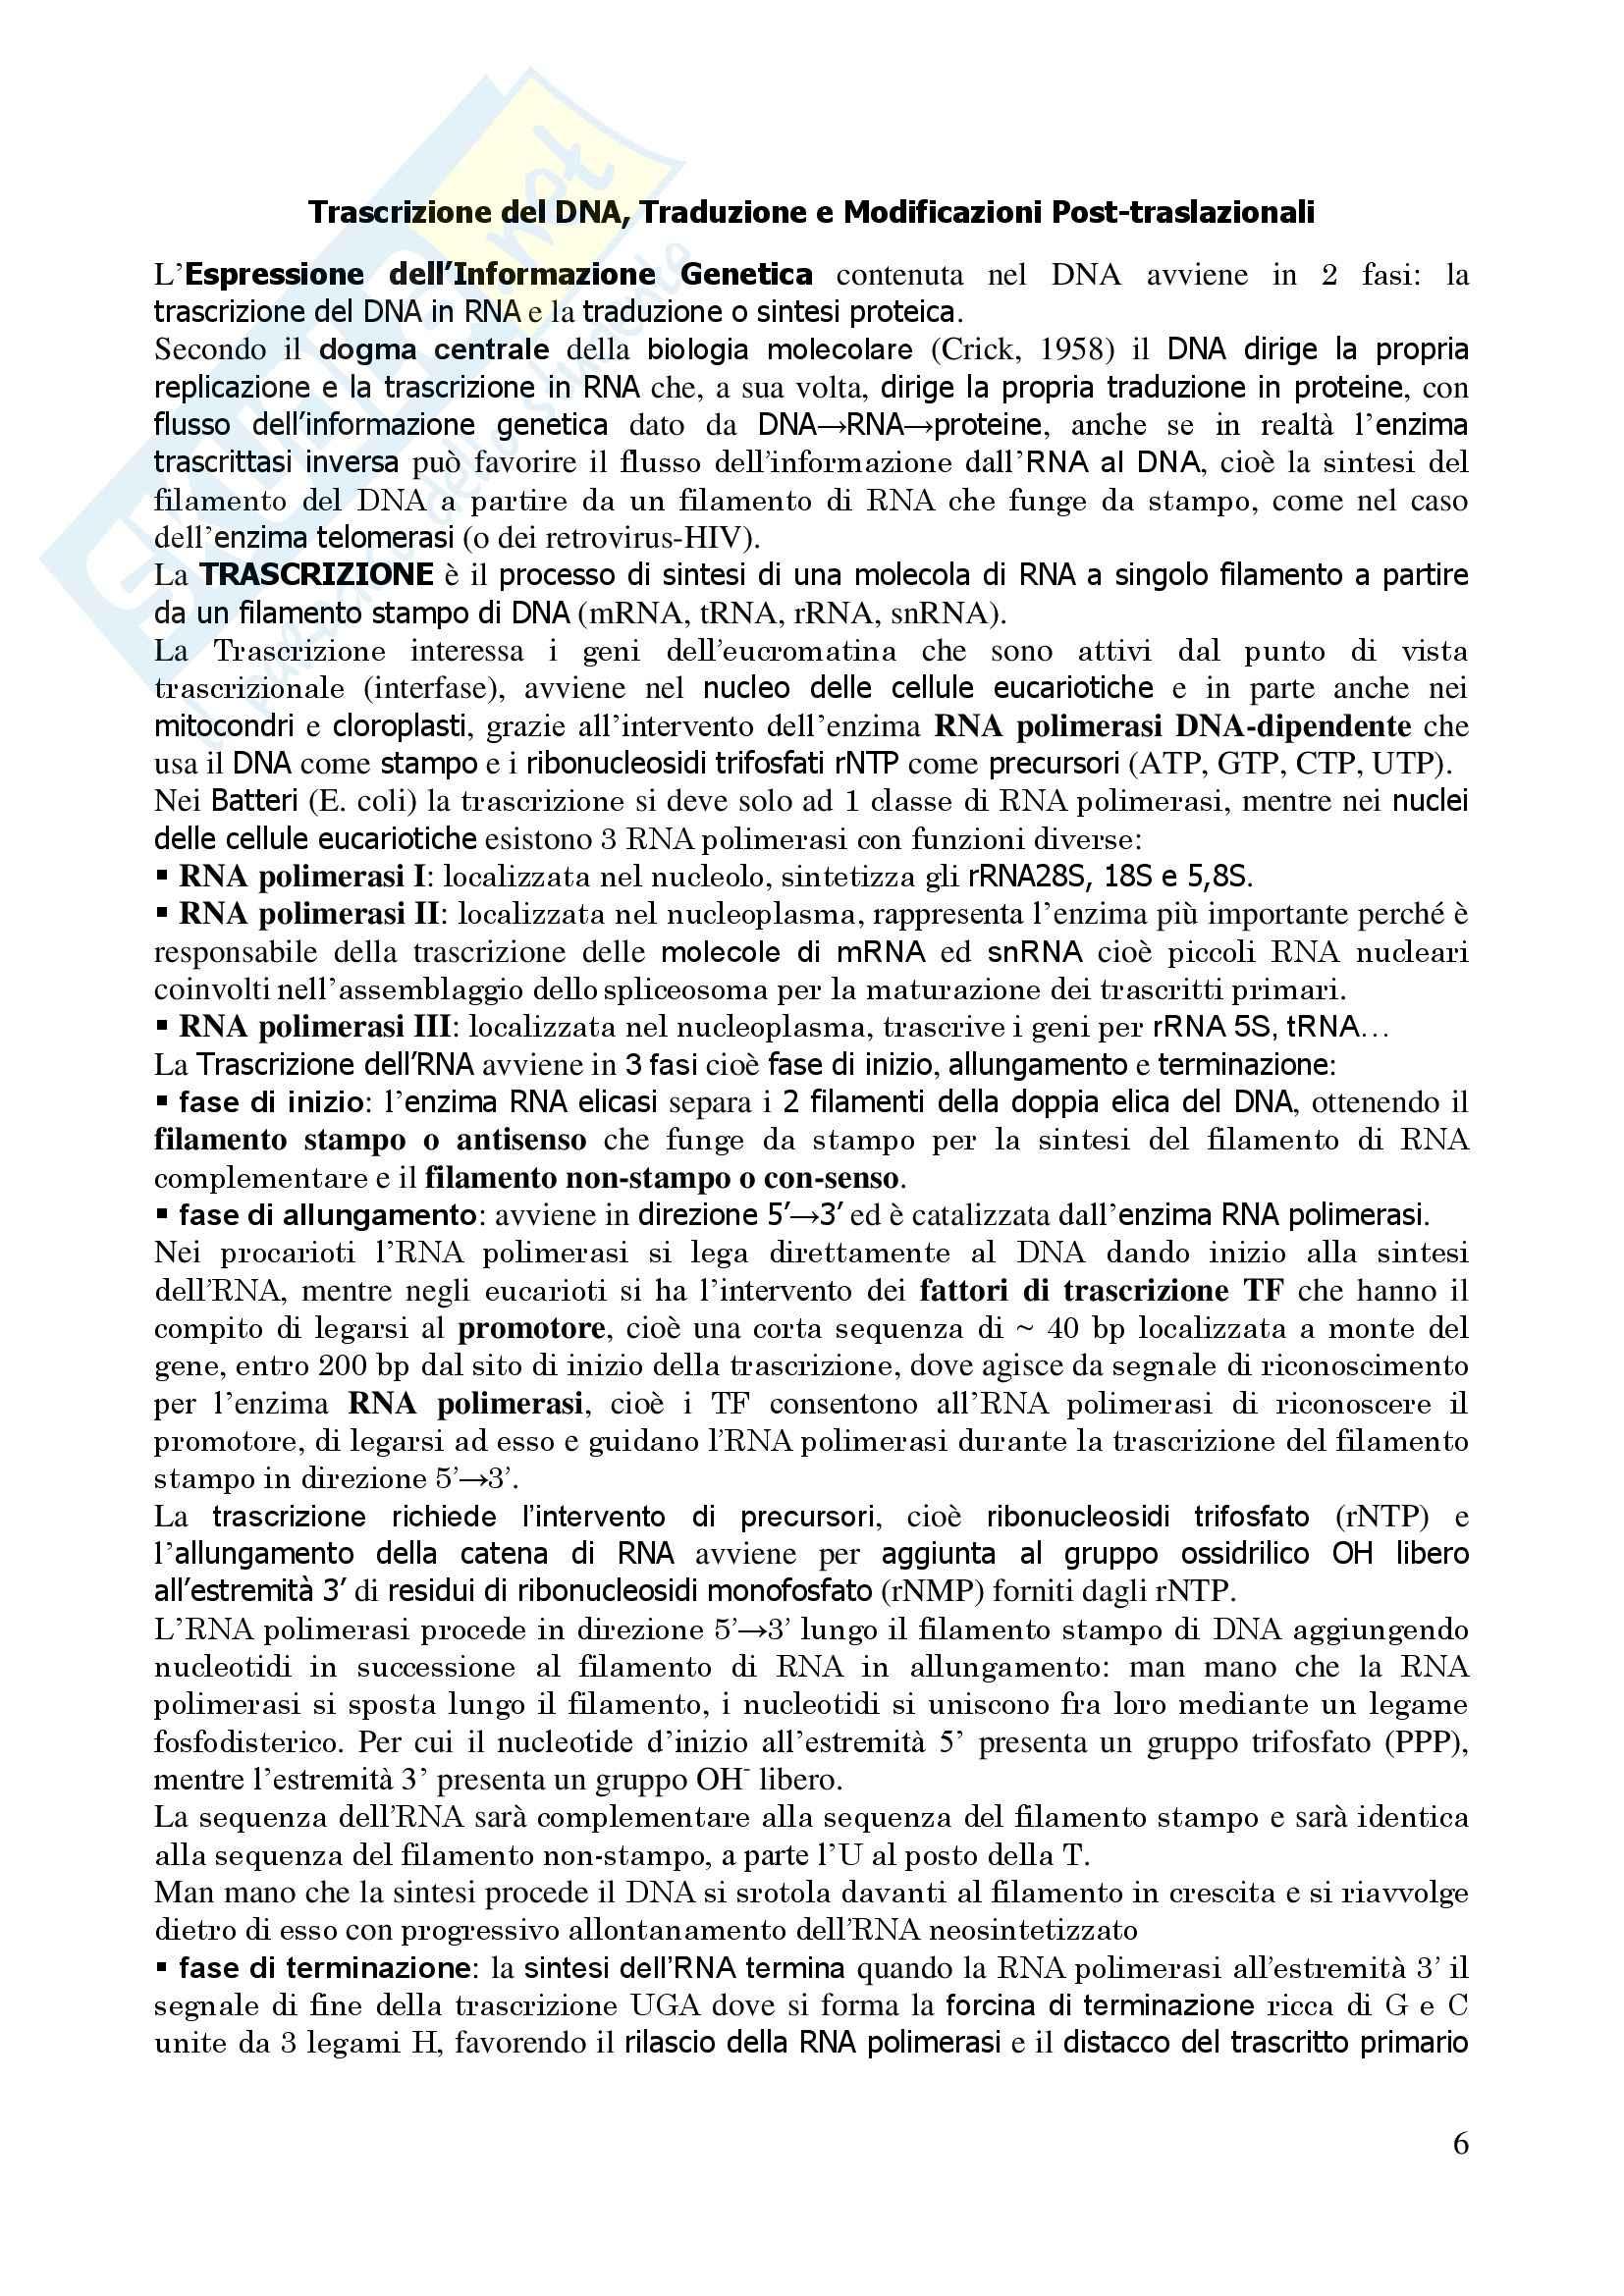 Genetica Umana - Appunti Pag. 6